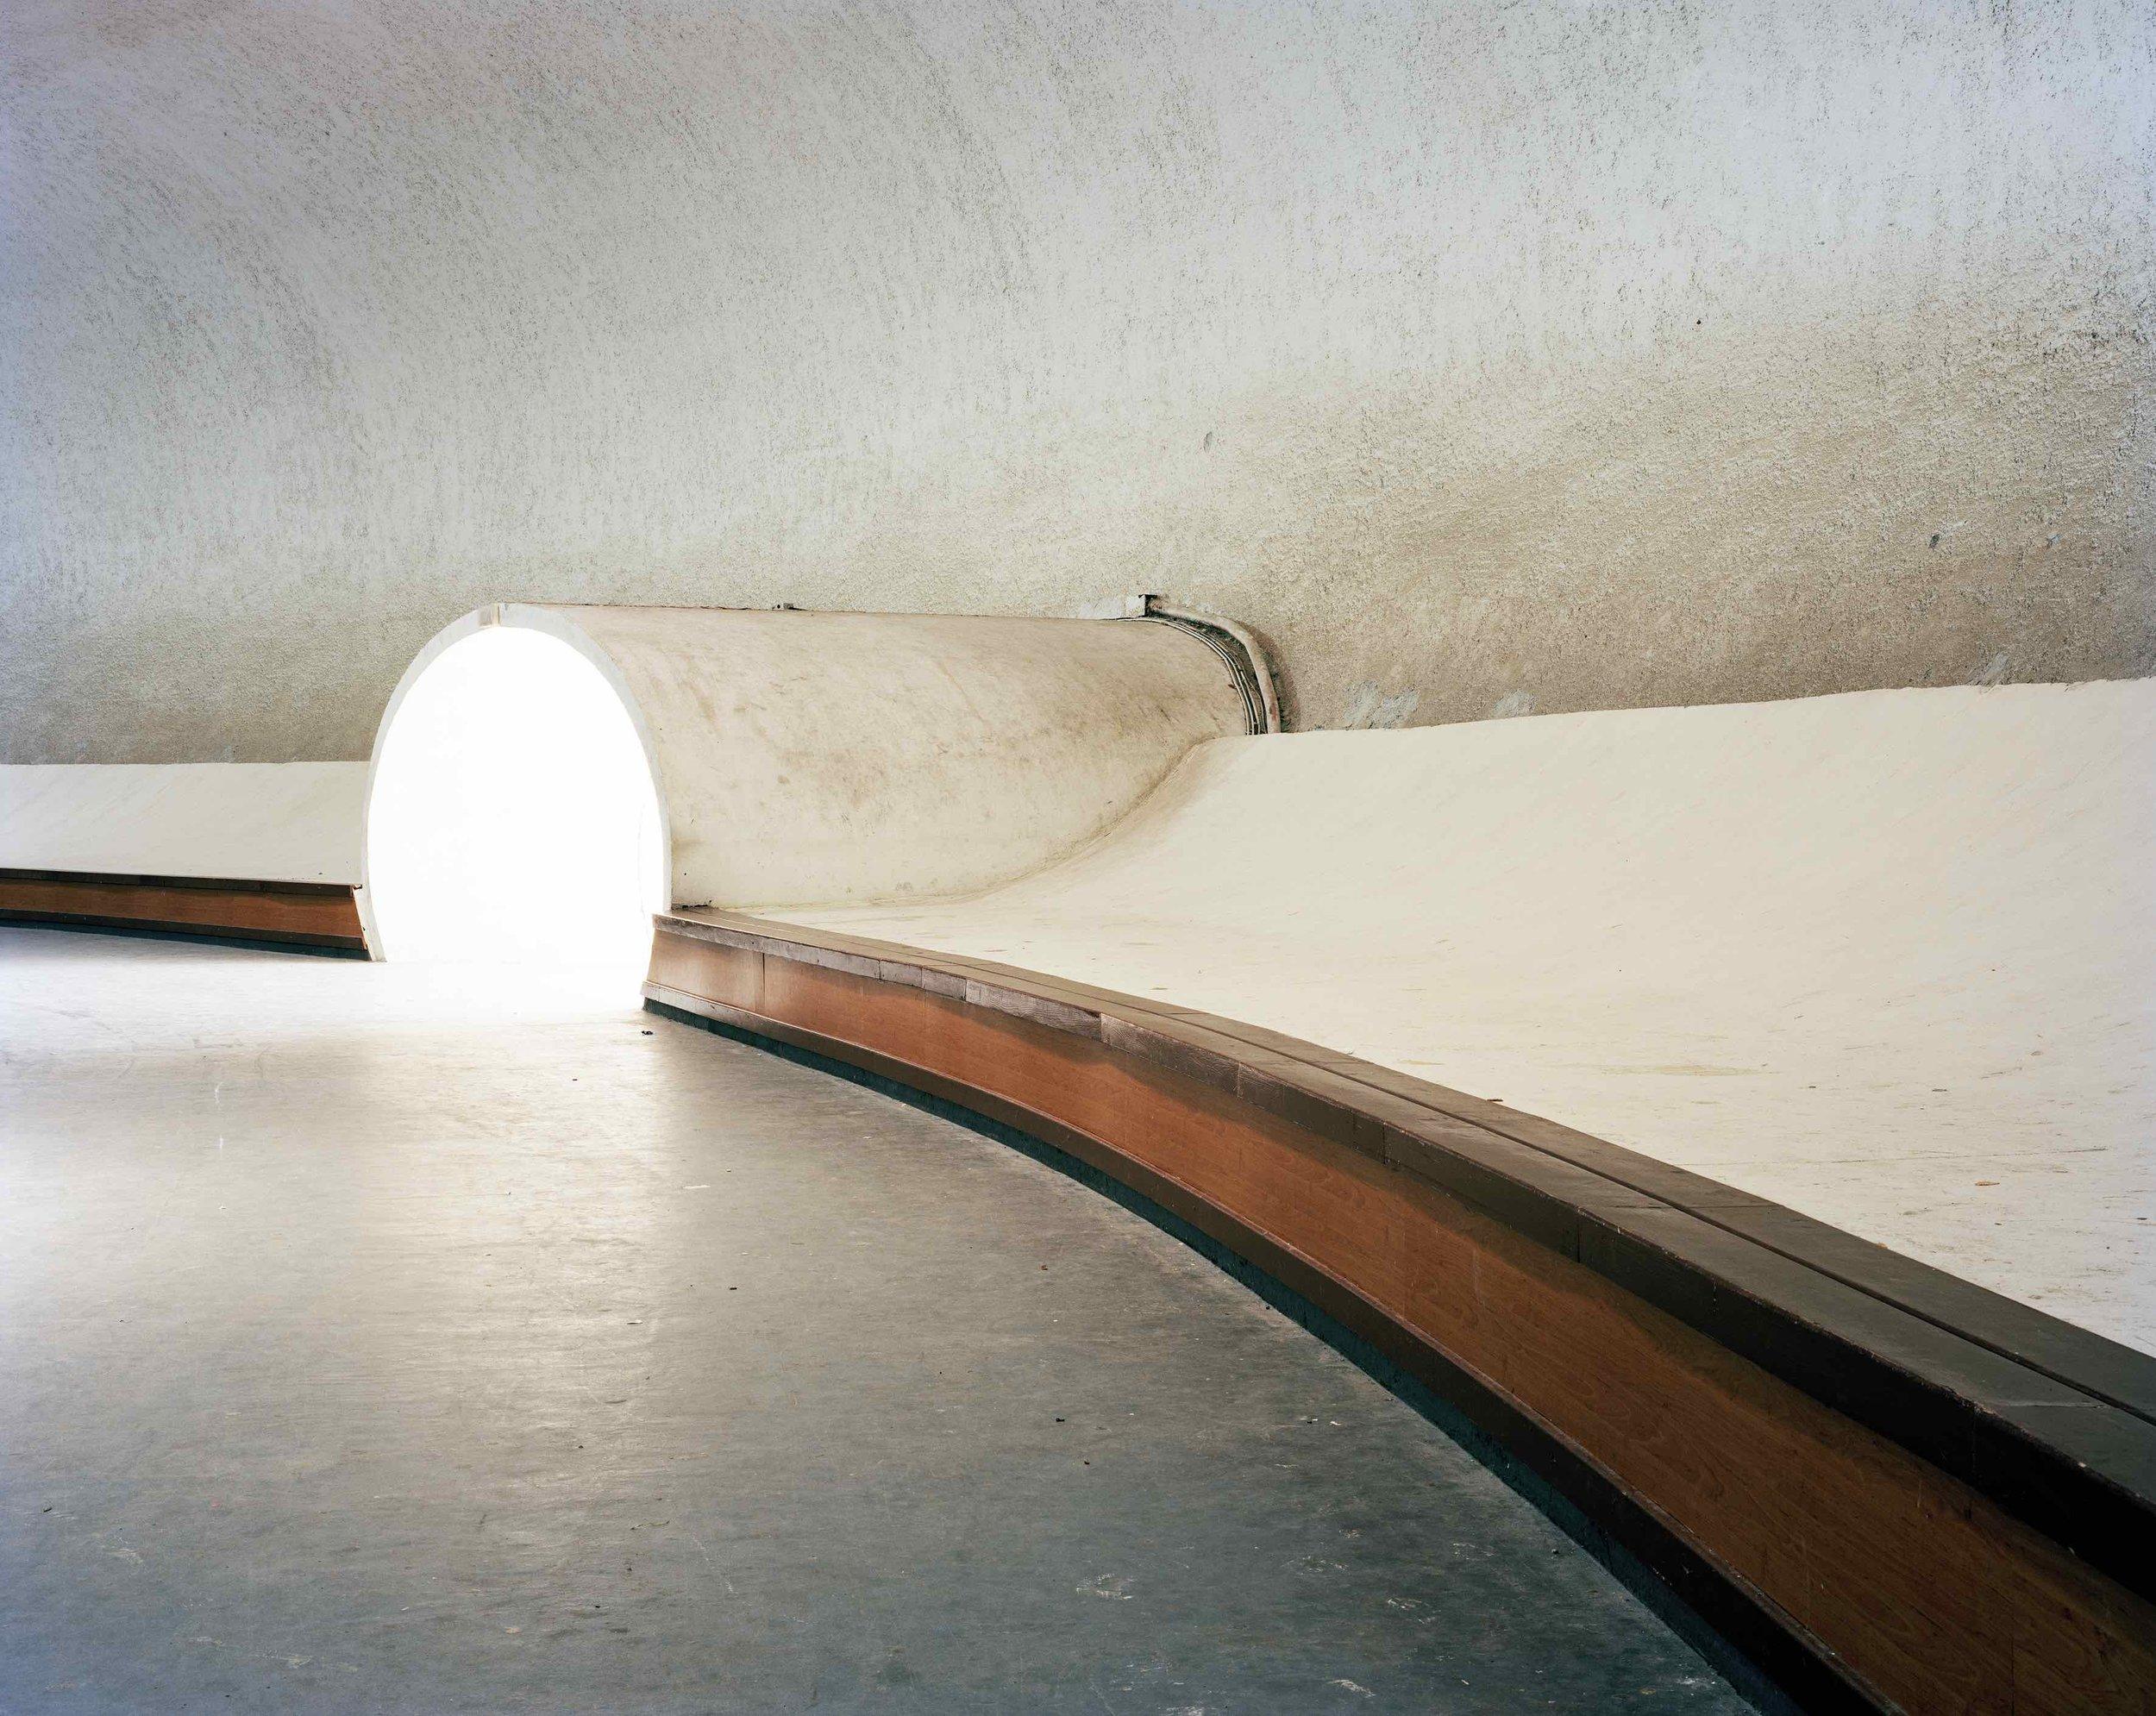 Salle Omnisport, Algiers, Algeria, 2013 by Jason Oddy